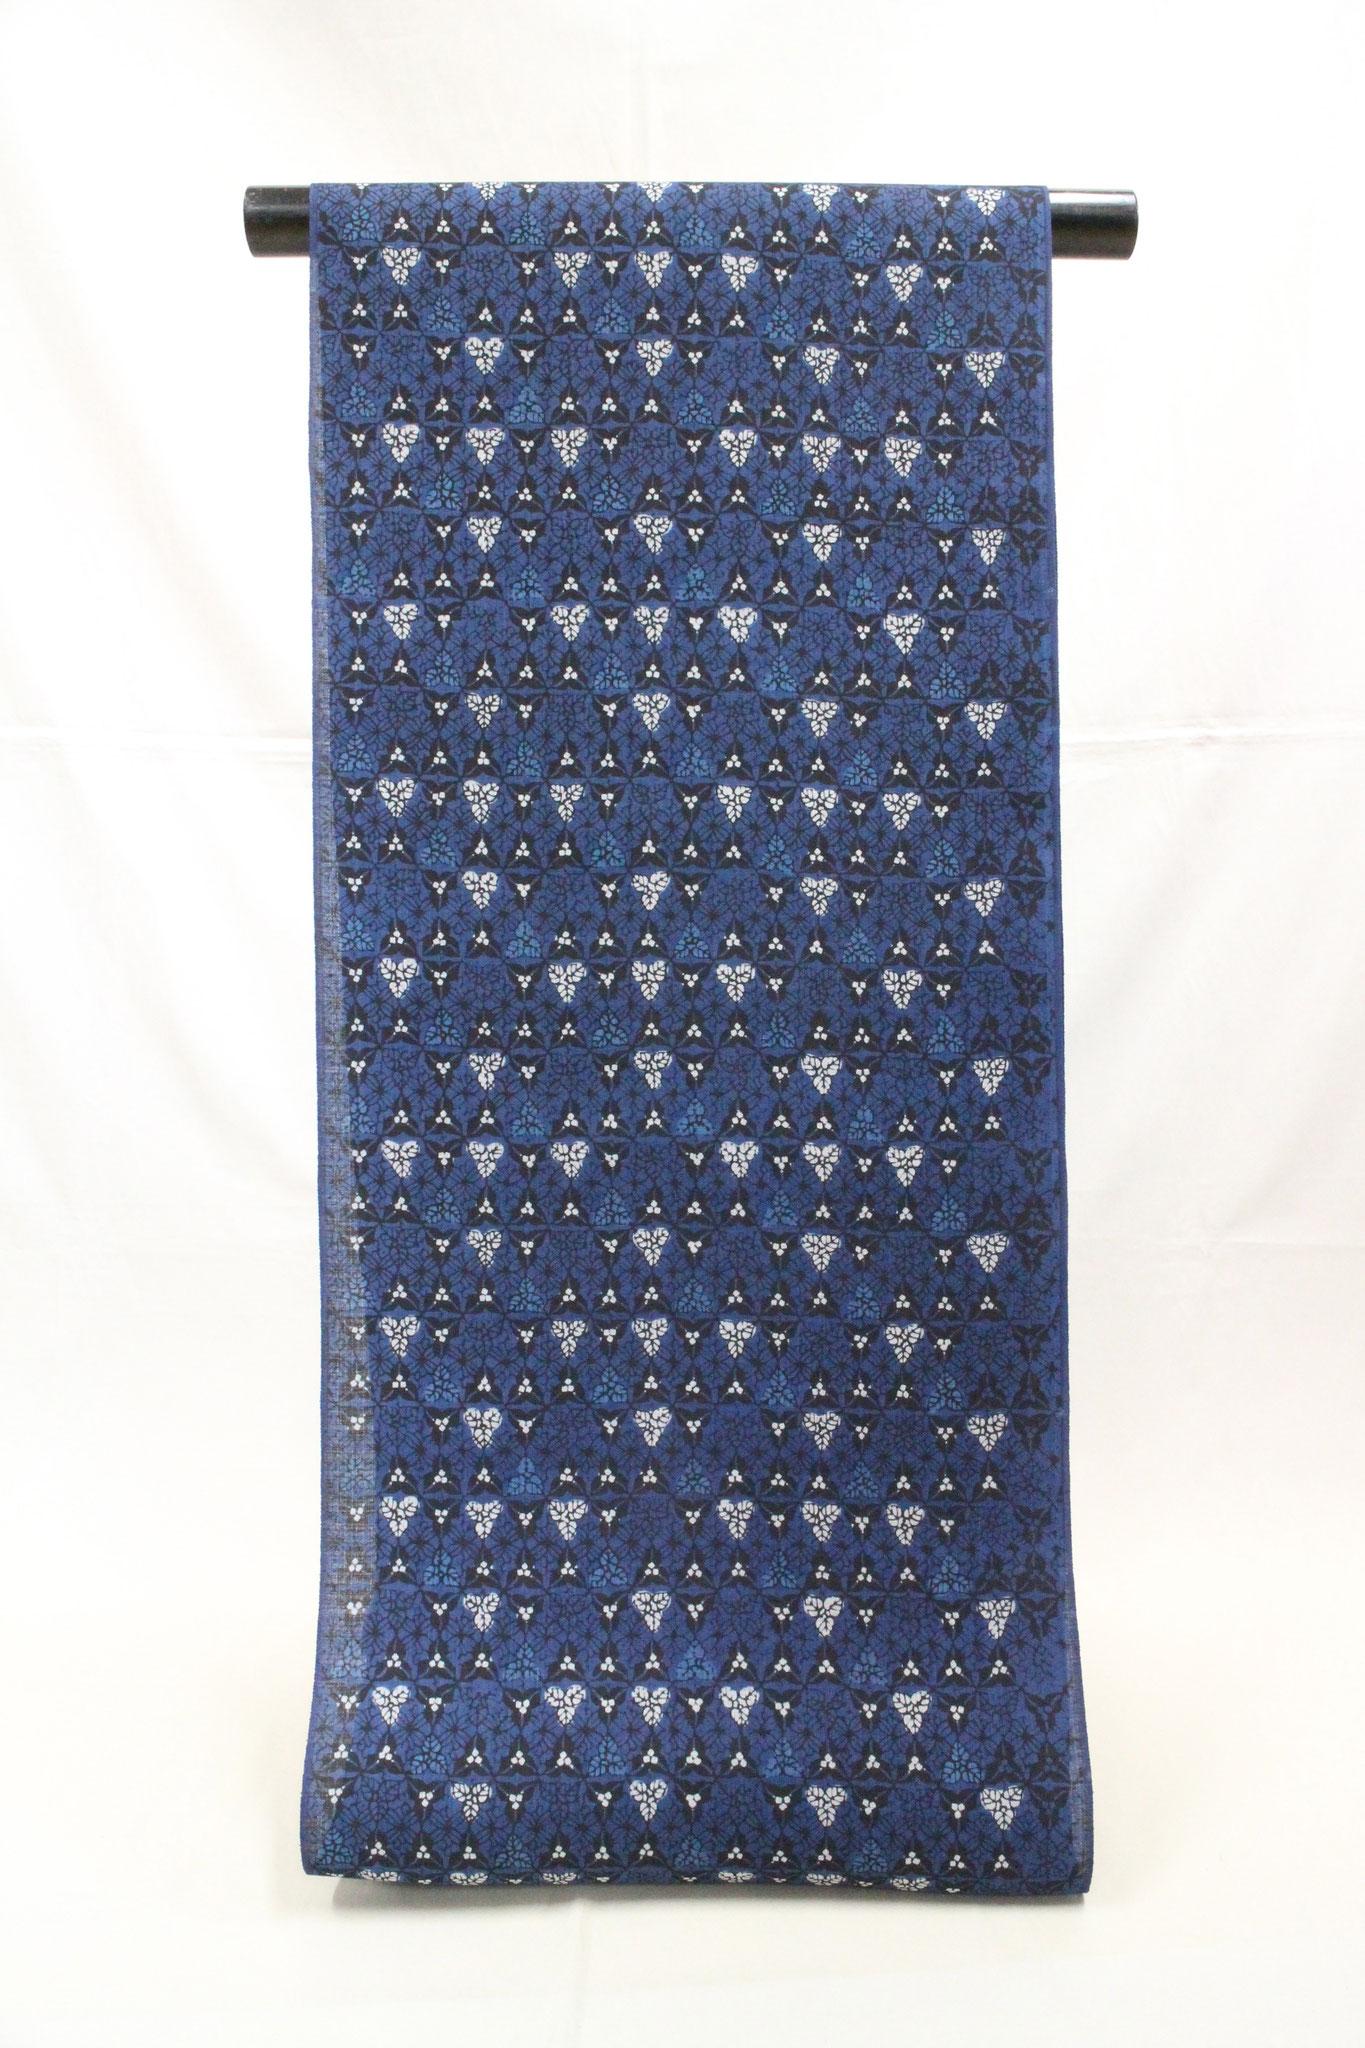 藍型 花繋ぎ  桐生紬